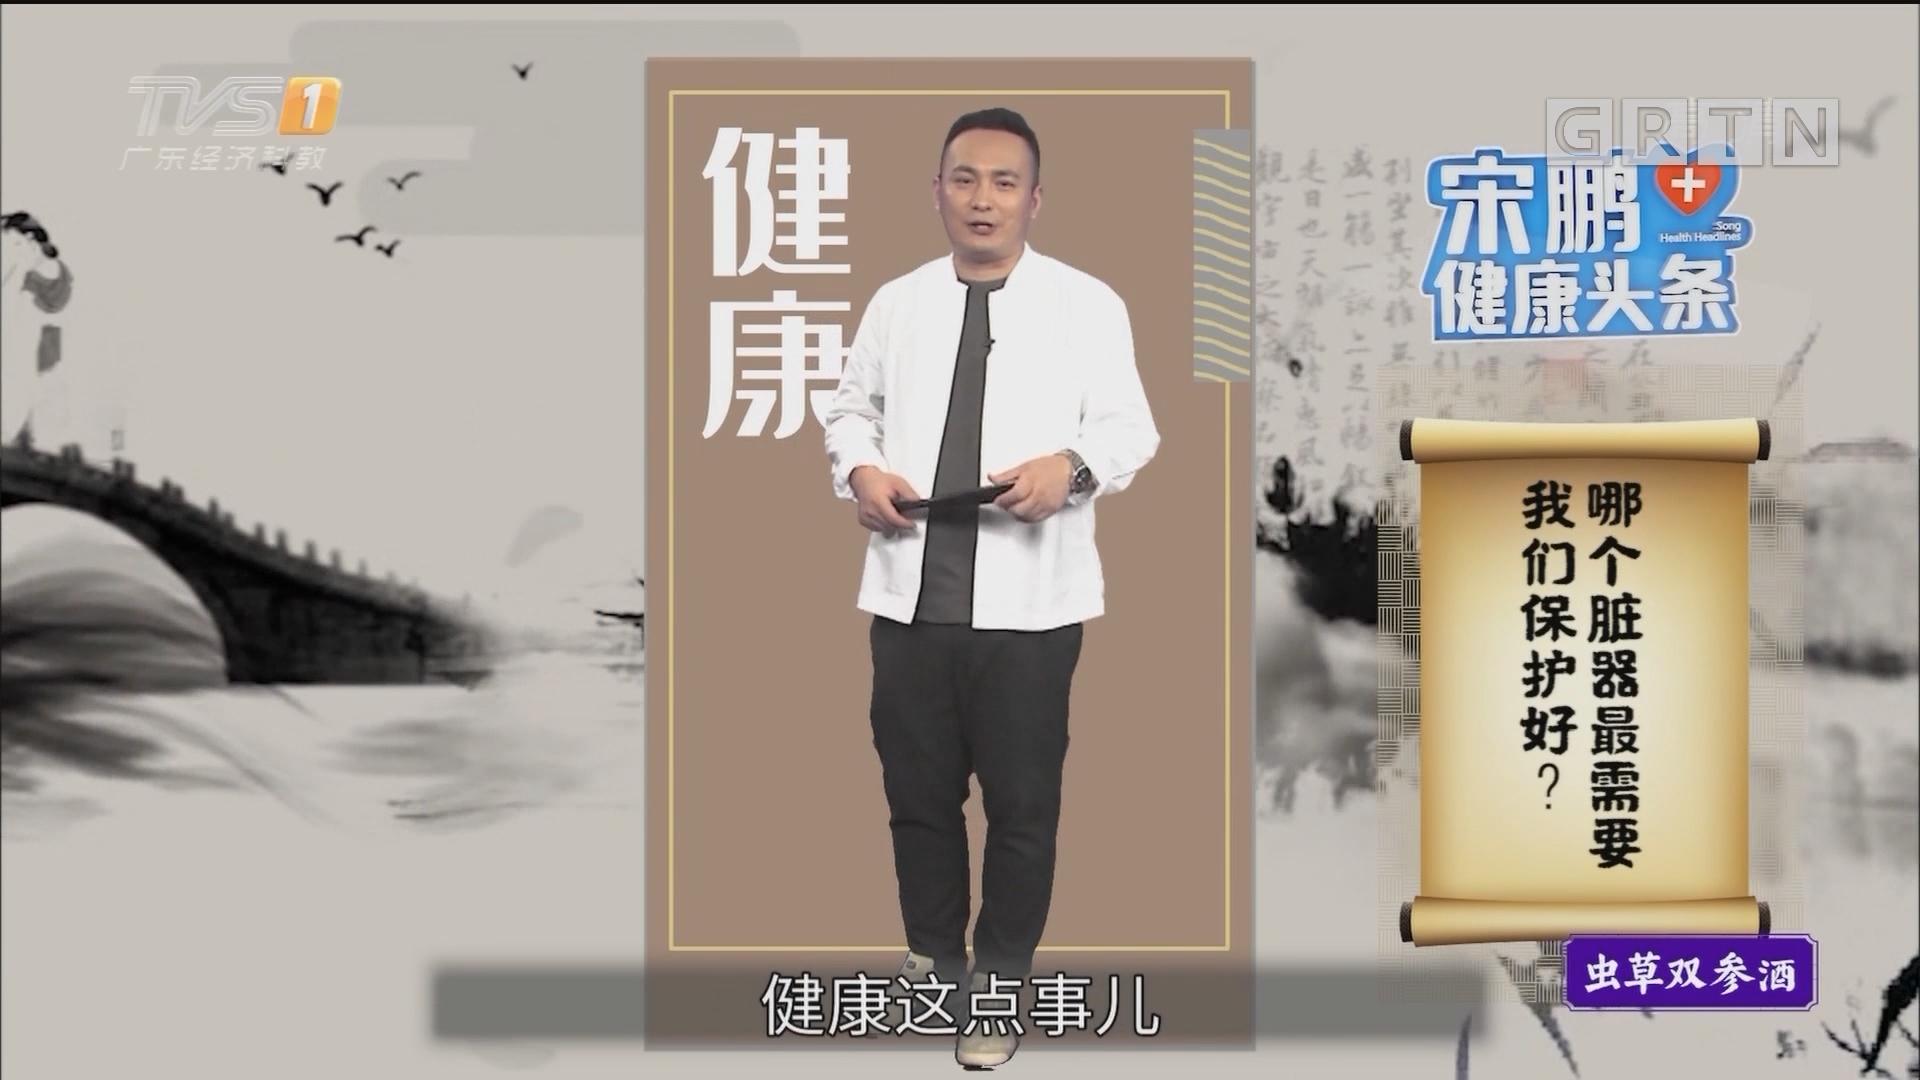 [HD][2019-09-17]经视健康+:宋鹏健康头条:哪个脏器最需要我们保护好?